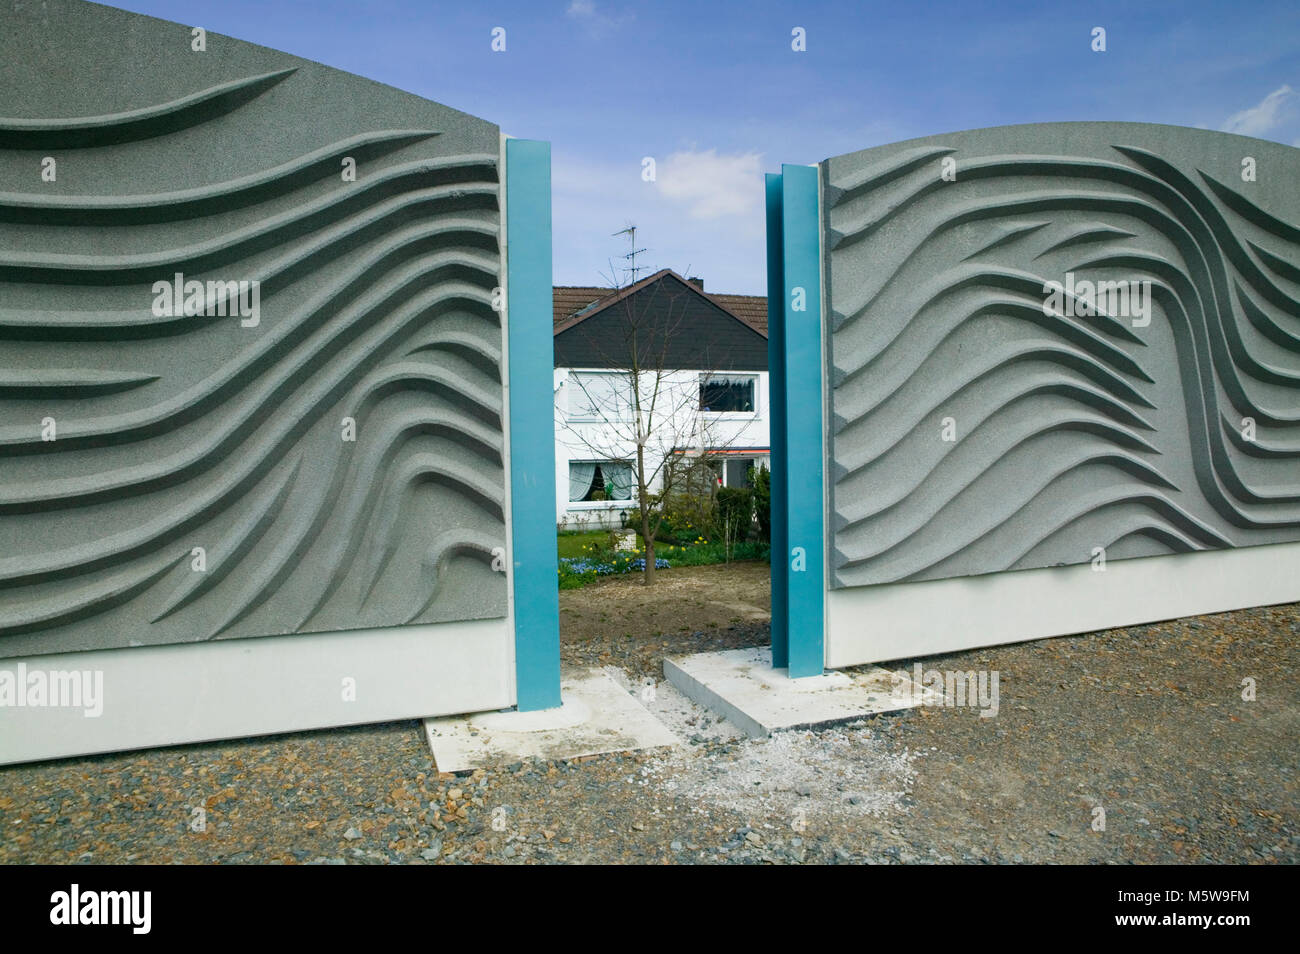 A noise barrier at Meinerzhagen, North Rhine-Westphalia, Germany, Europe - Stock Image